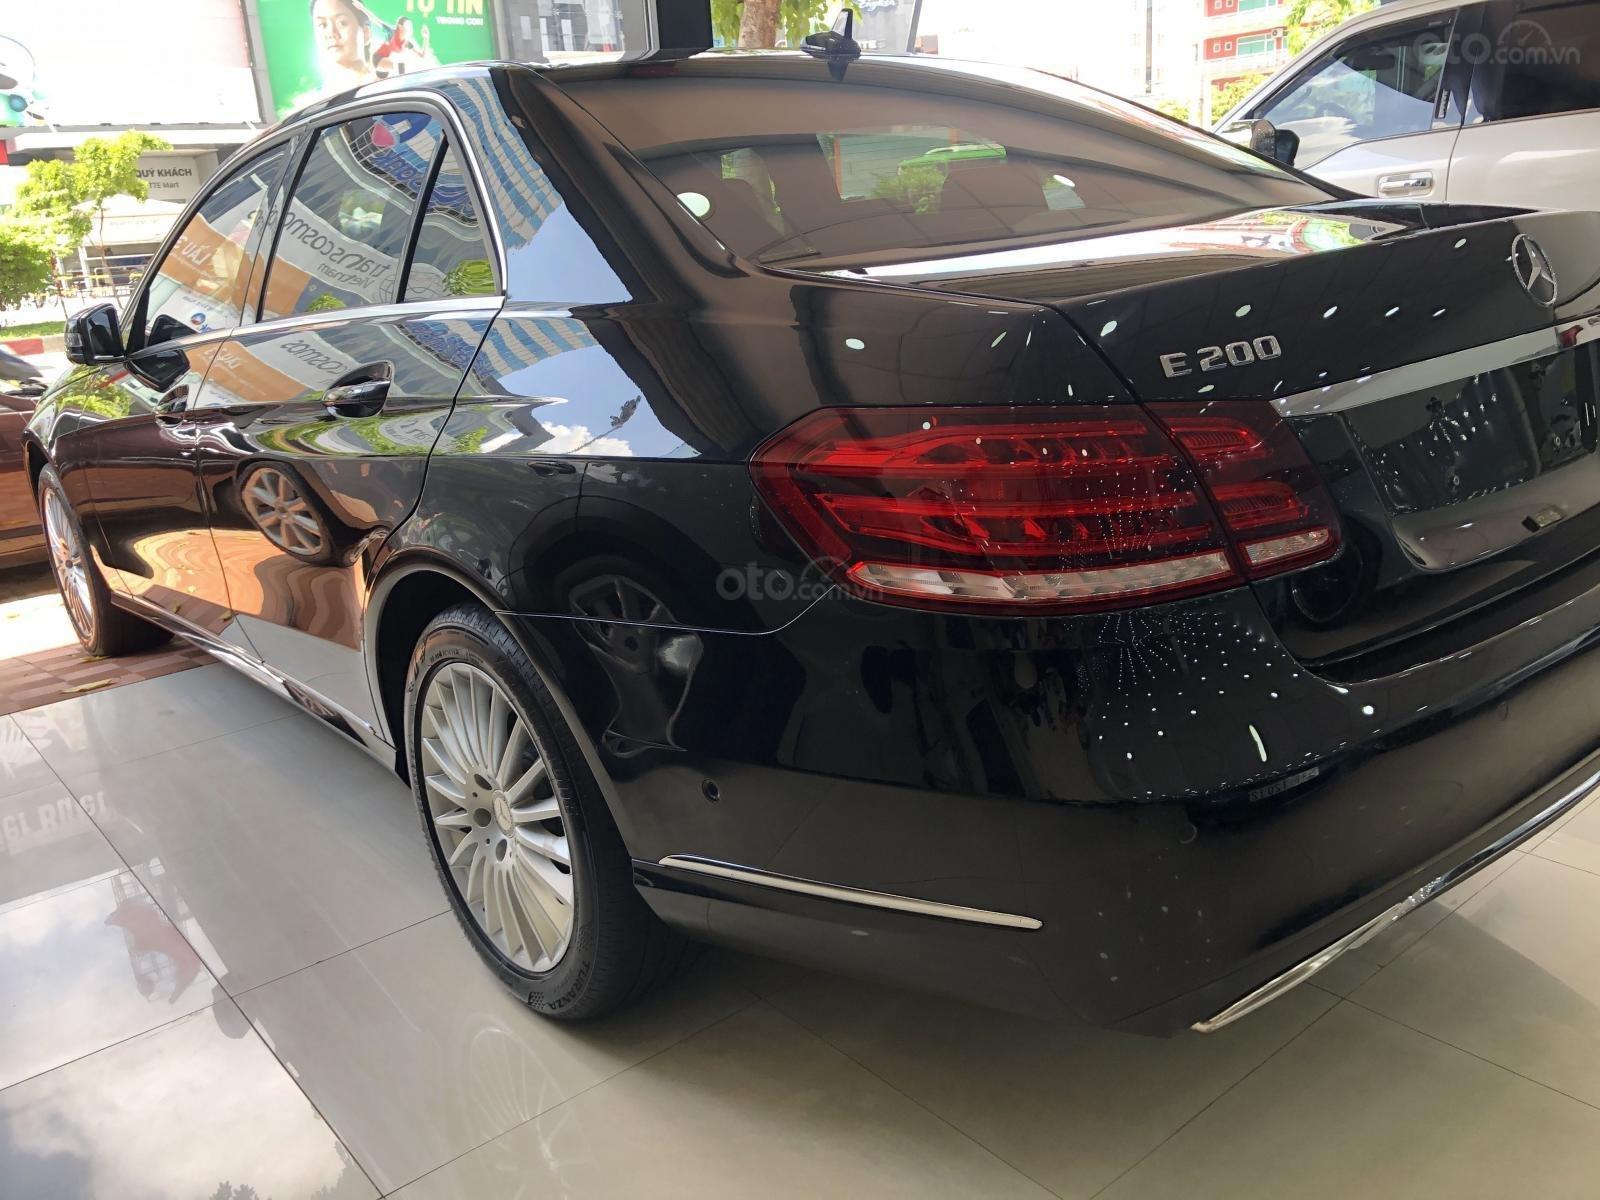 Cần bán xe Mercedes-Benz E200 sản xuất 2015, ĐKLĐ 2016 (5)